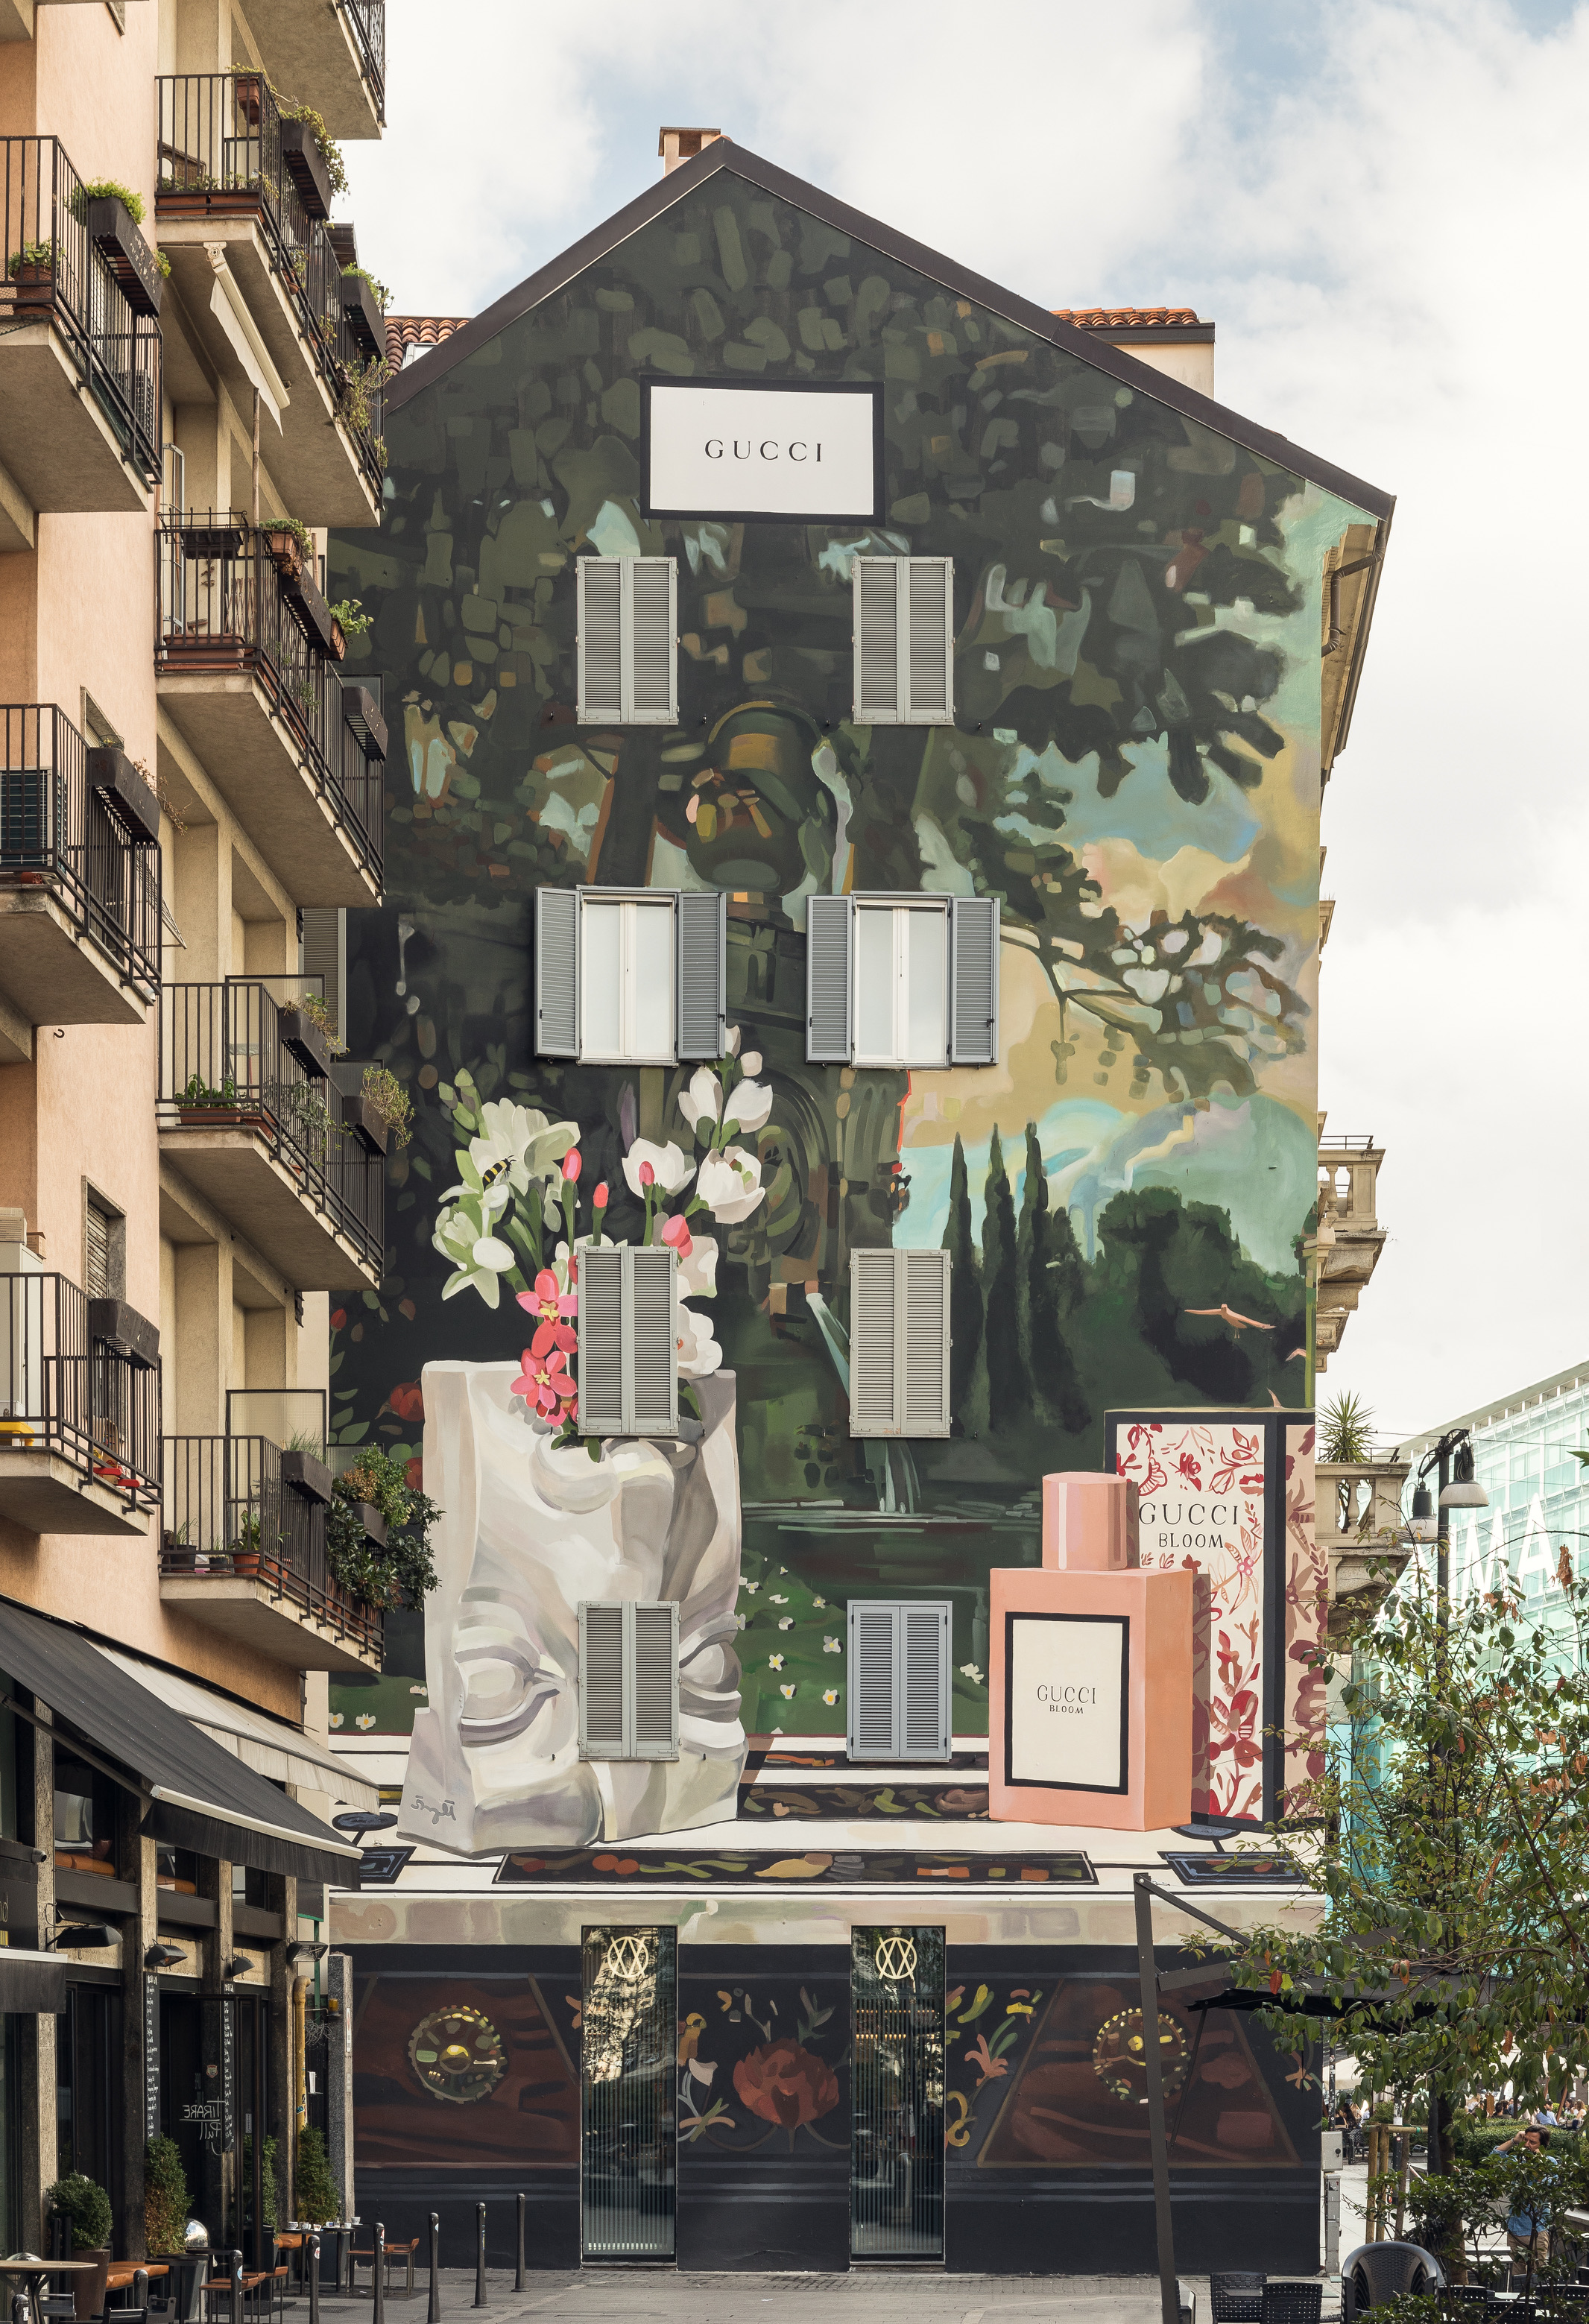 Gucci bloom paris social diary for Craft fair nyc 2017